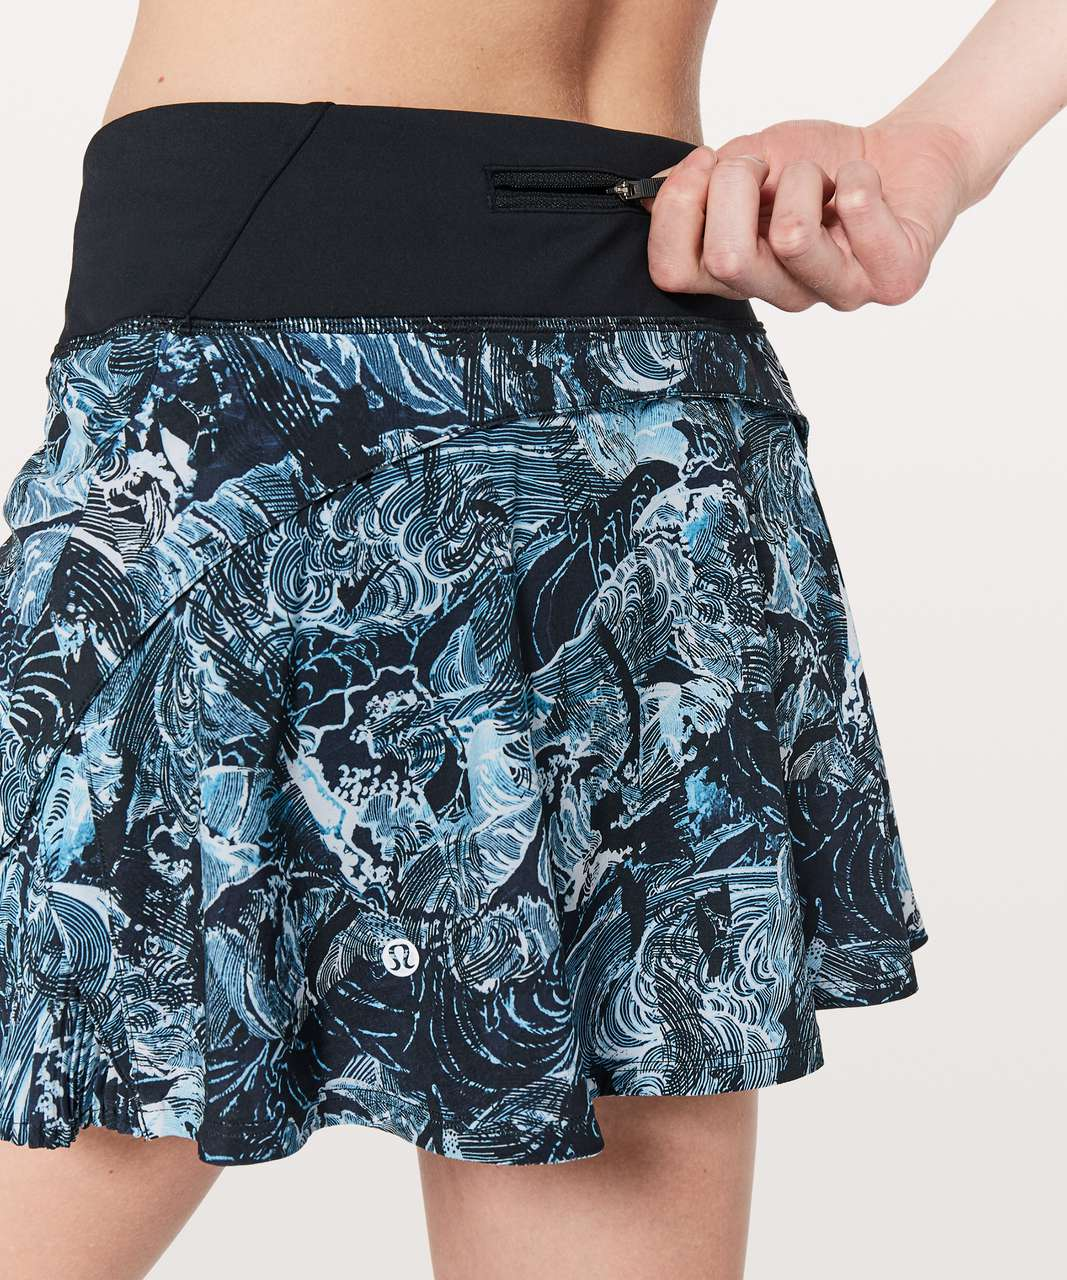 "Lululemon Play Off The Pleats Skirt *13"" - Eternal Wave Starlight Black / Black"